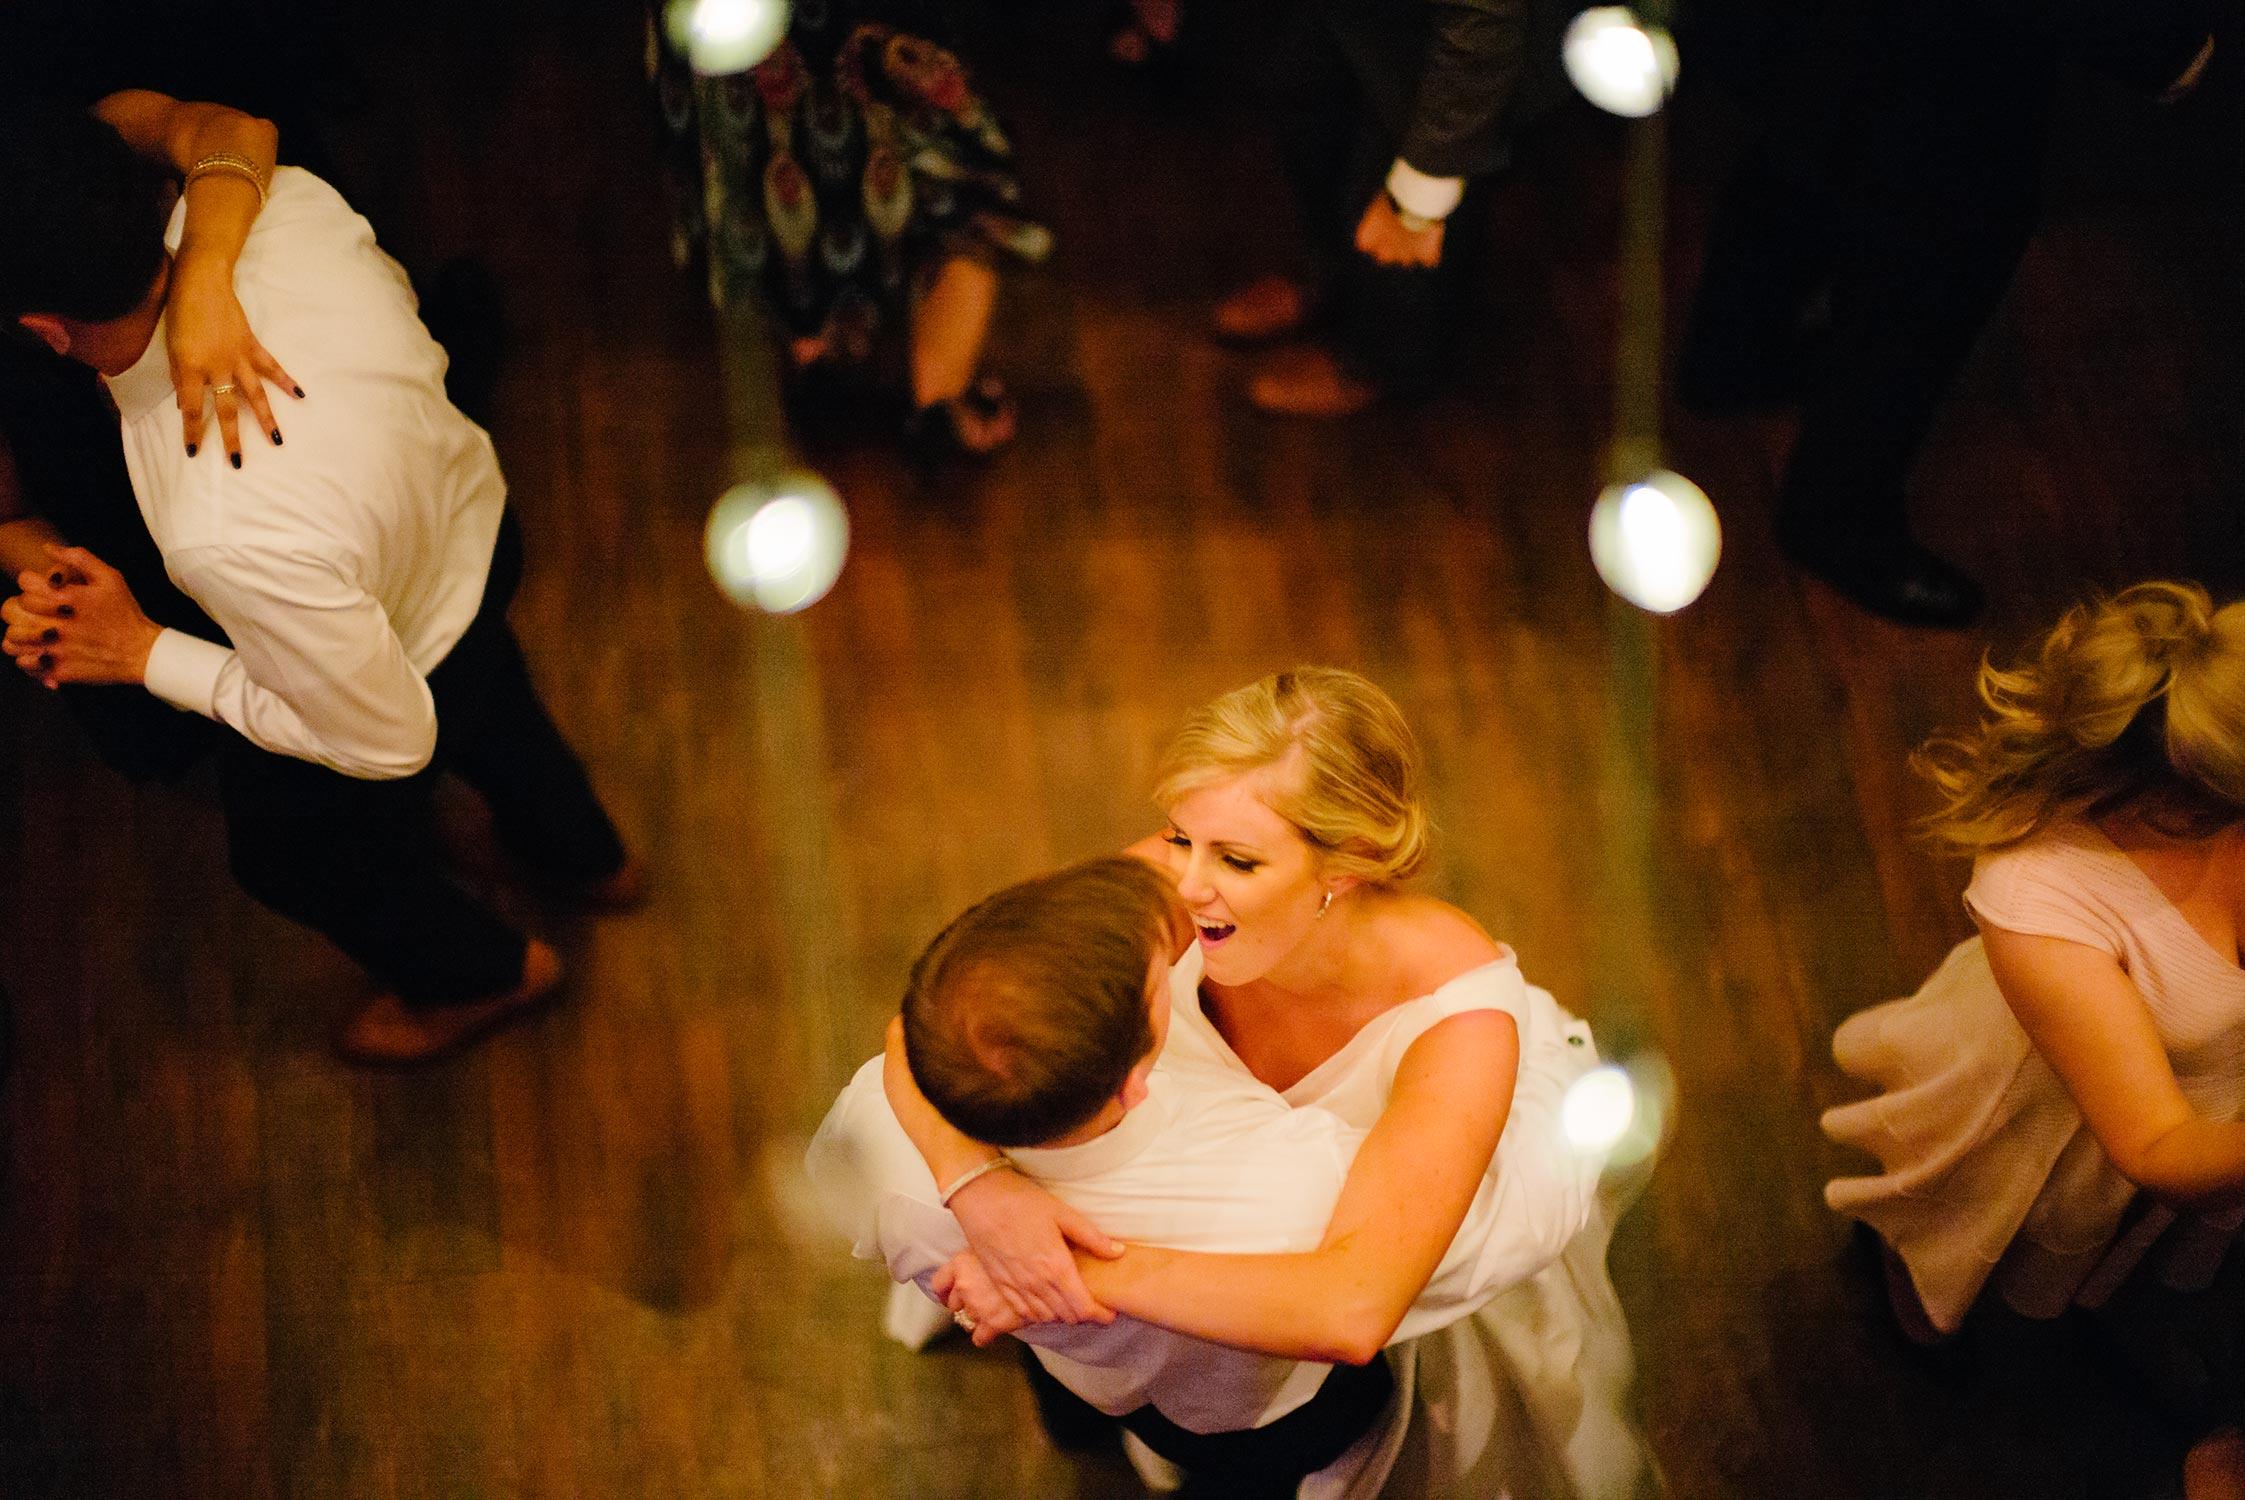 Couple first dance under edison style lightbulbs wedding reception best-houston-wedding-photographers